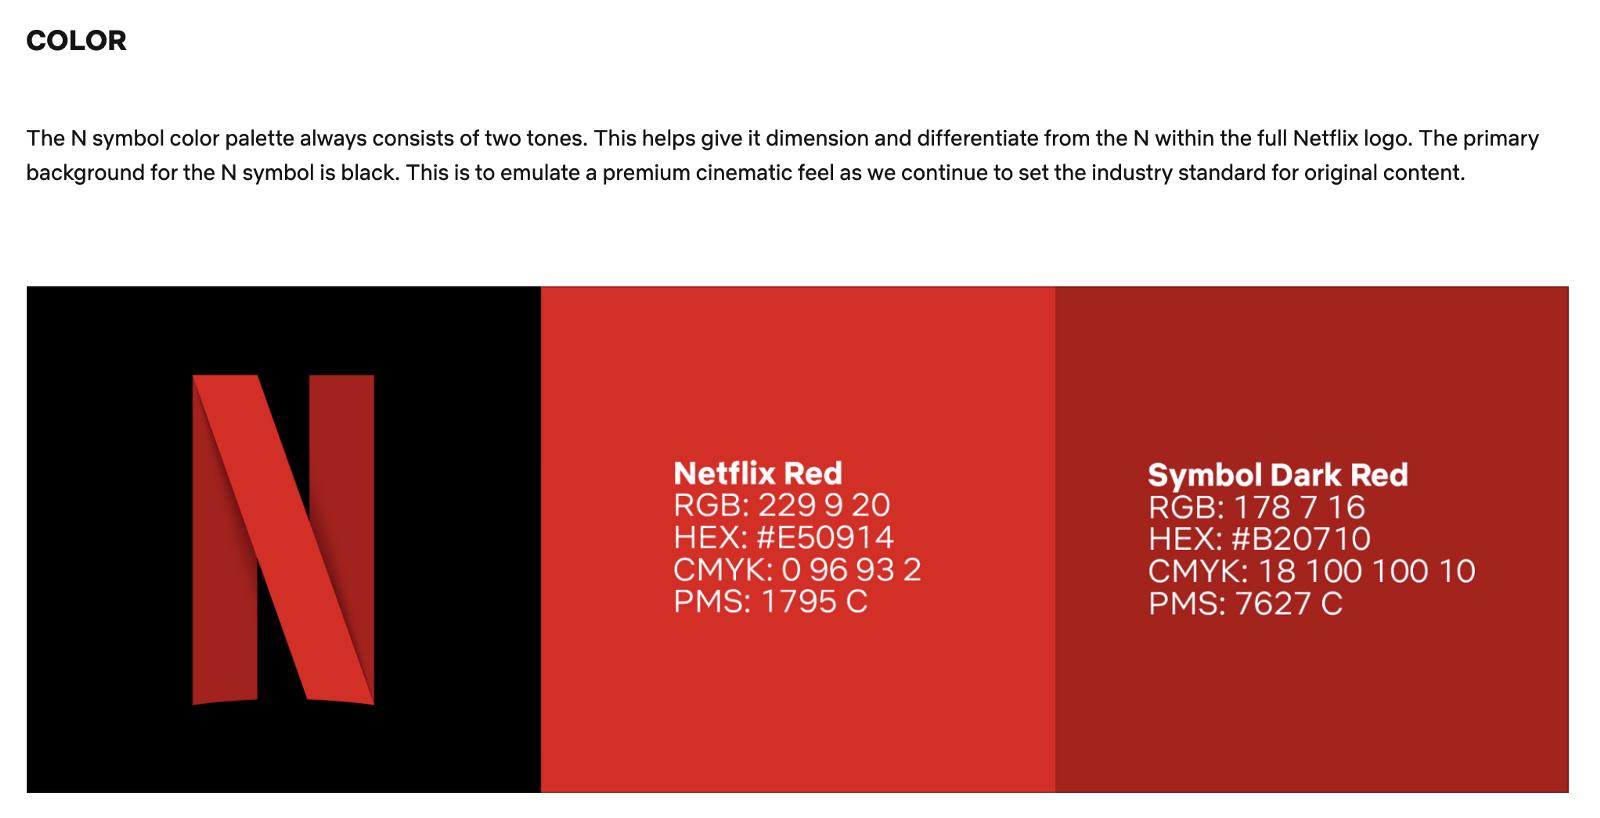 Netflix brand guidelines (brand.netflix.com)